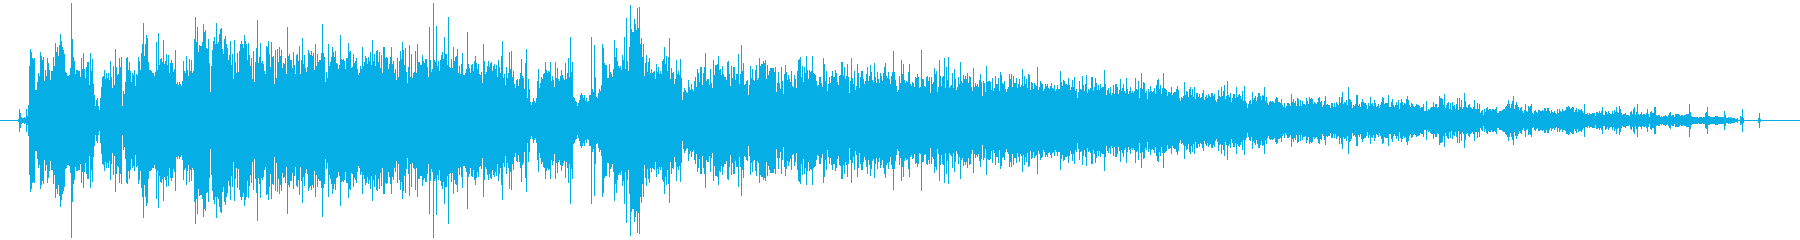 CINEMATIC BEEP 05の再生済みの波形